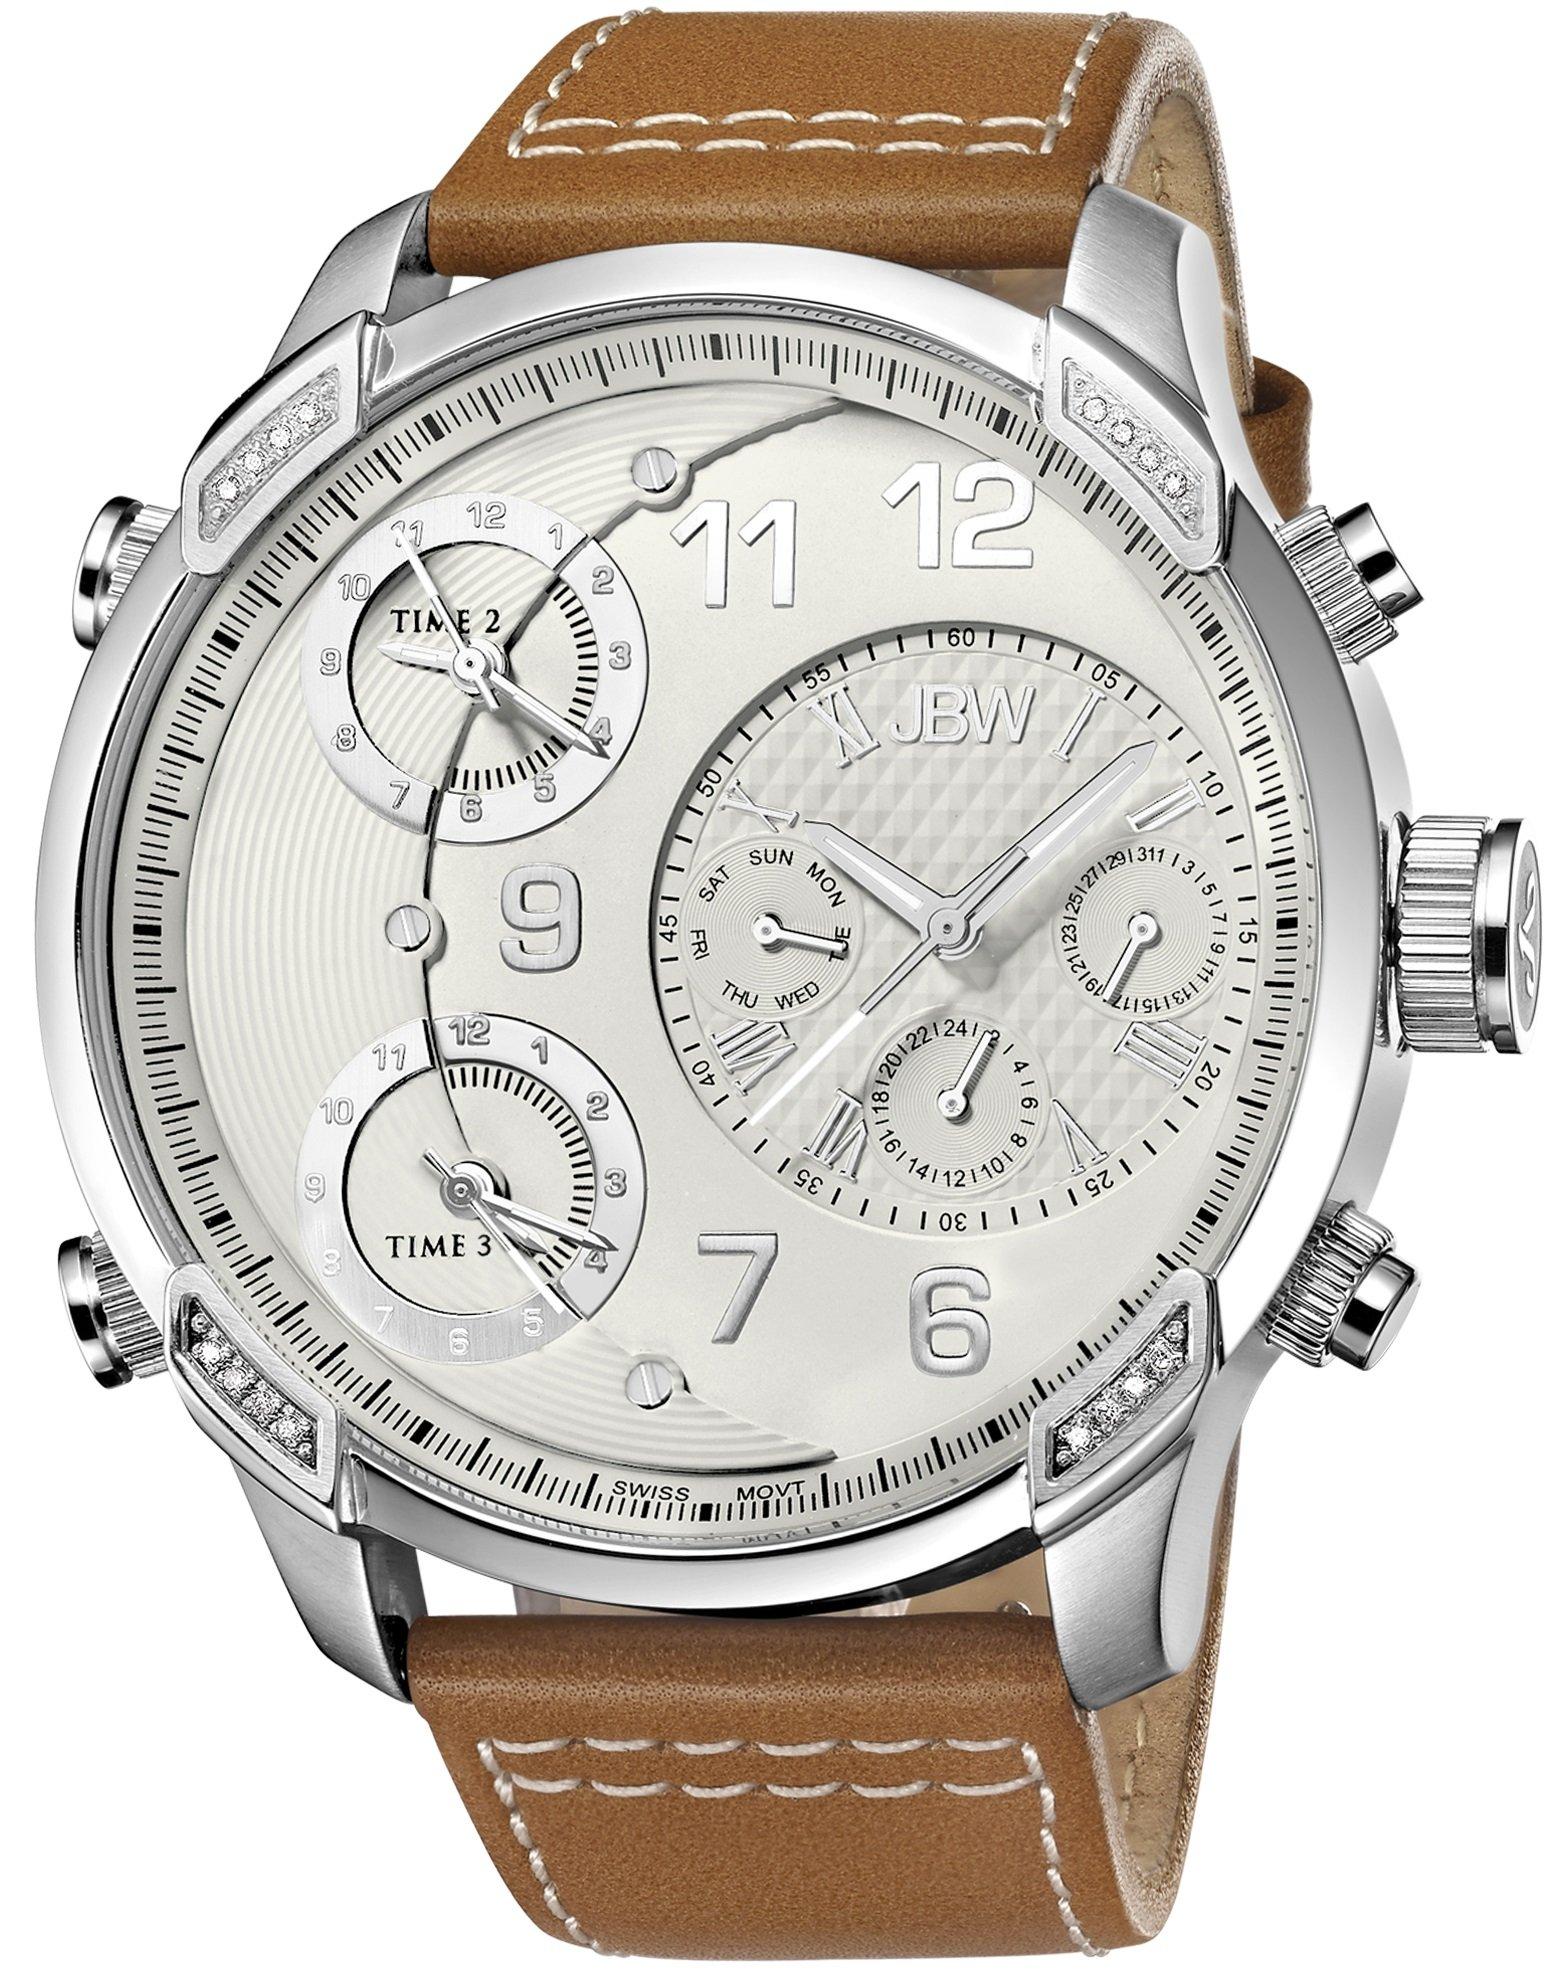 Jbw Men's J6248Lm G4 Analog Display Swiss Quartz Brown Watch 8